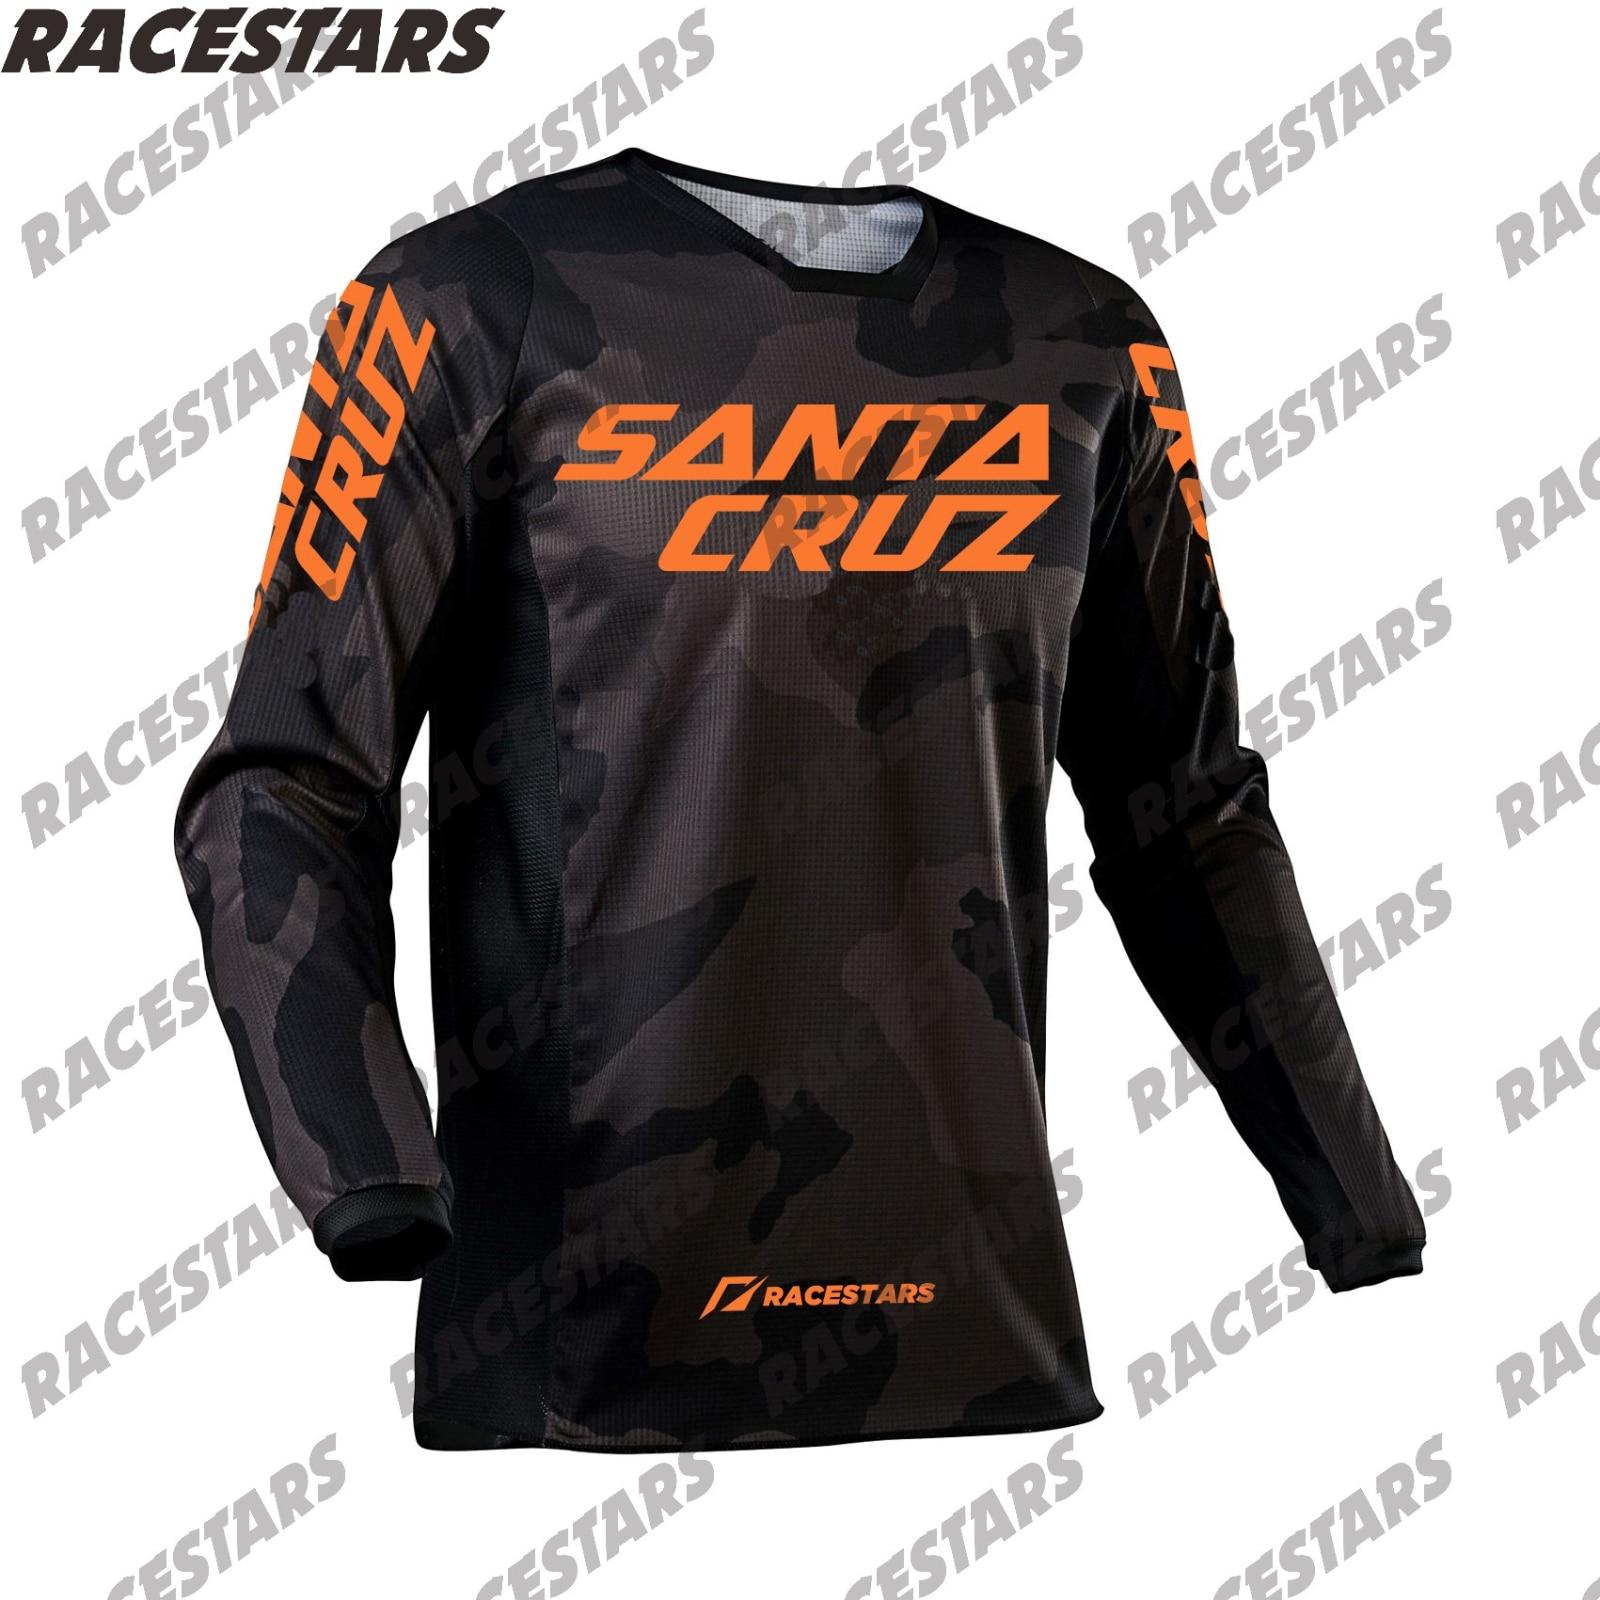 Camiseta de Motocross Enduro de SANTA CRUZ para Hombre, Maillot de Ciclismo...